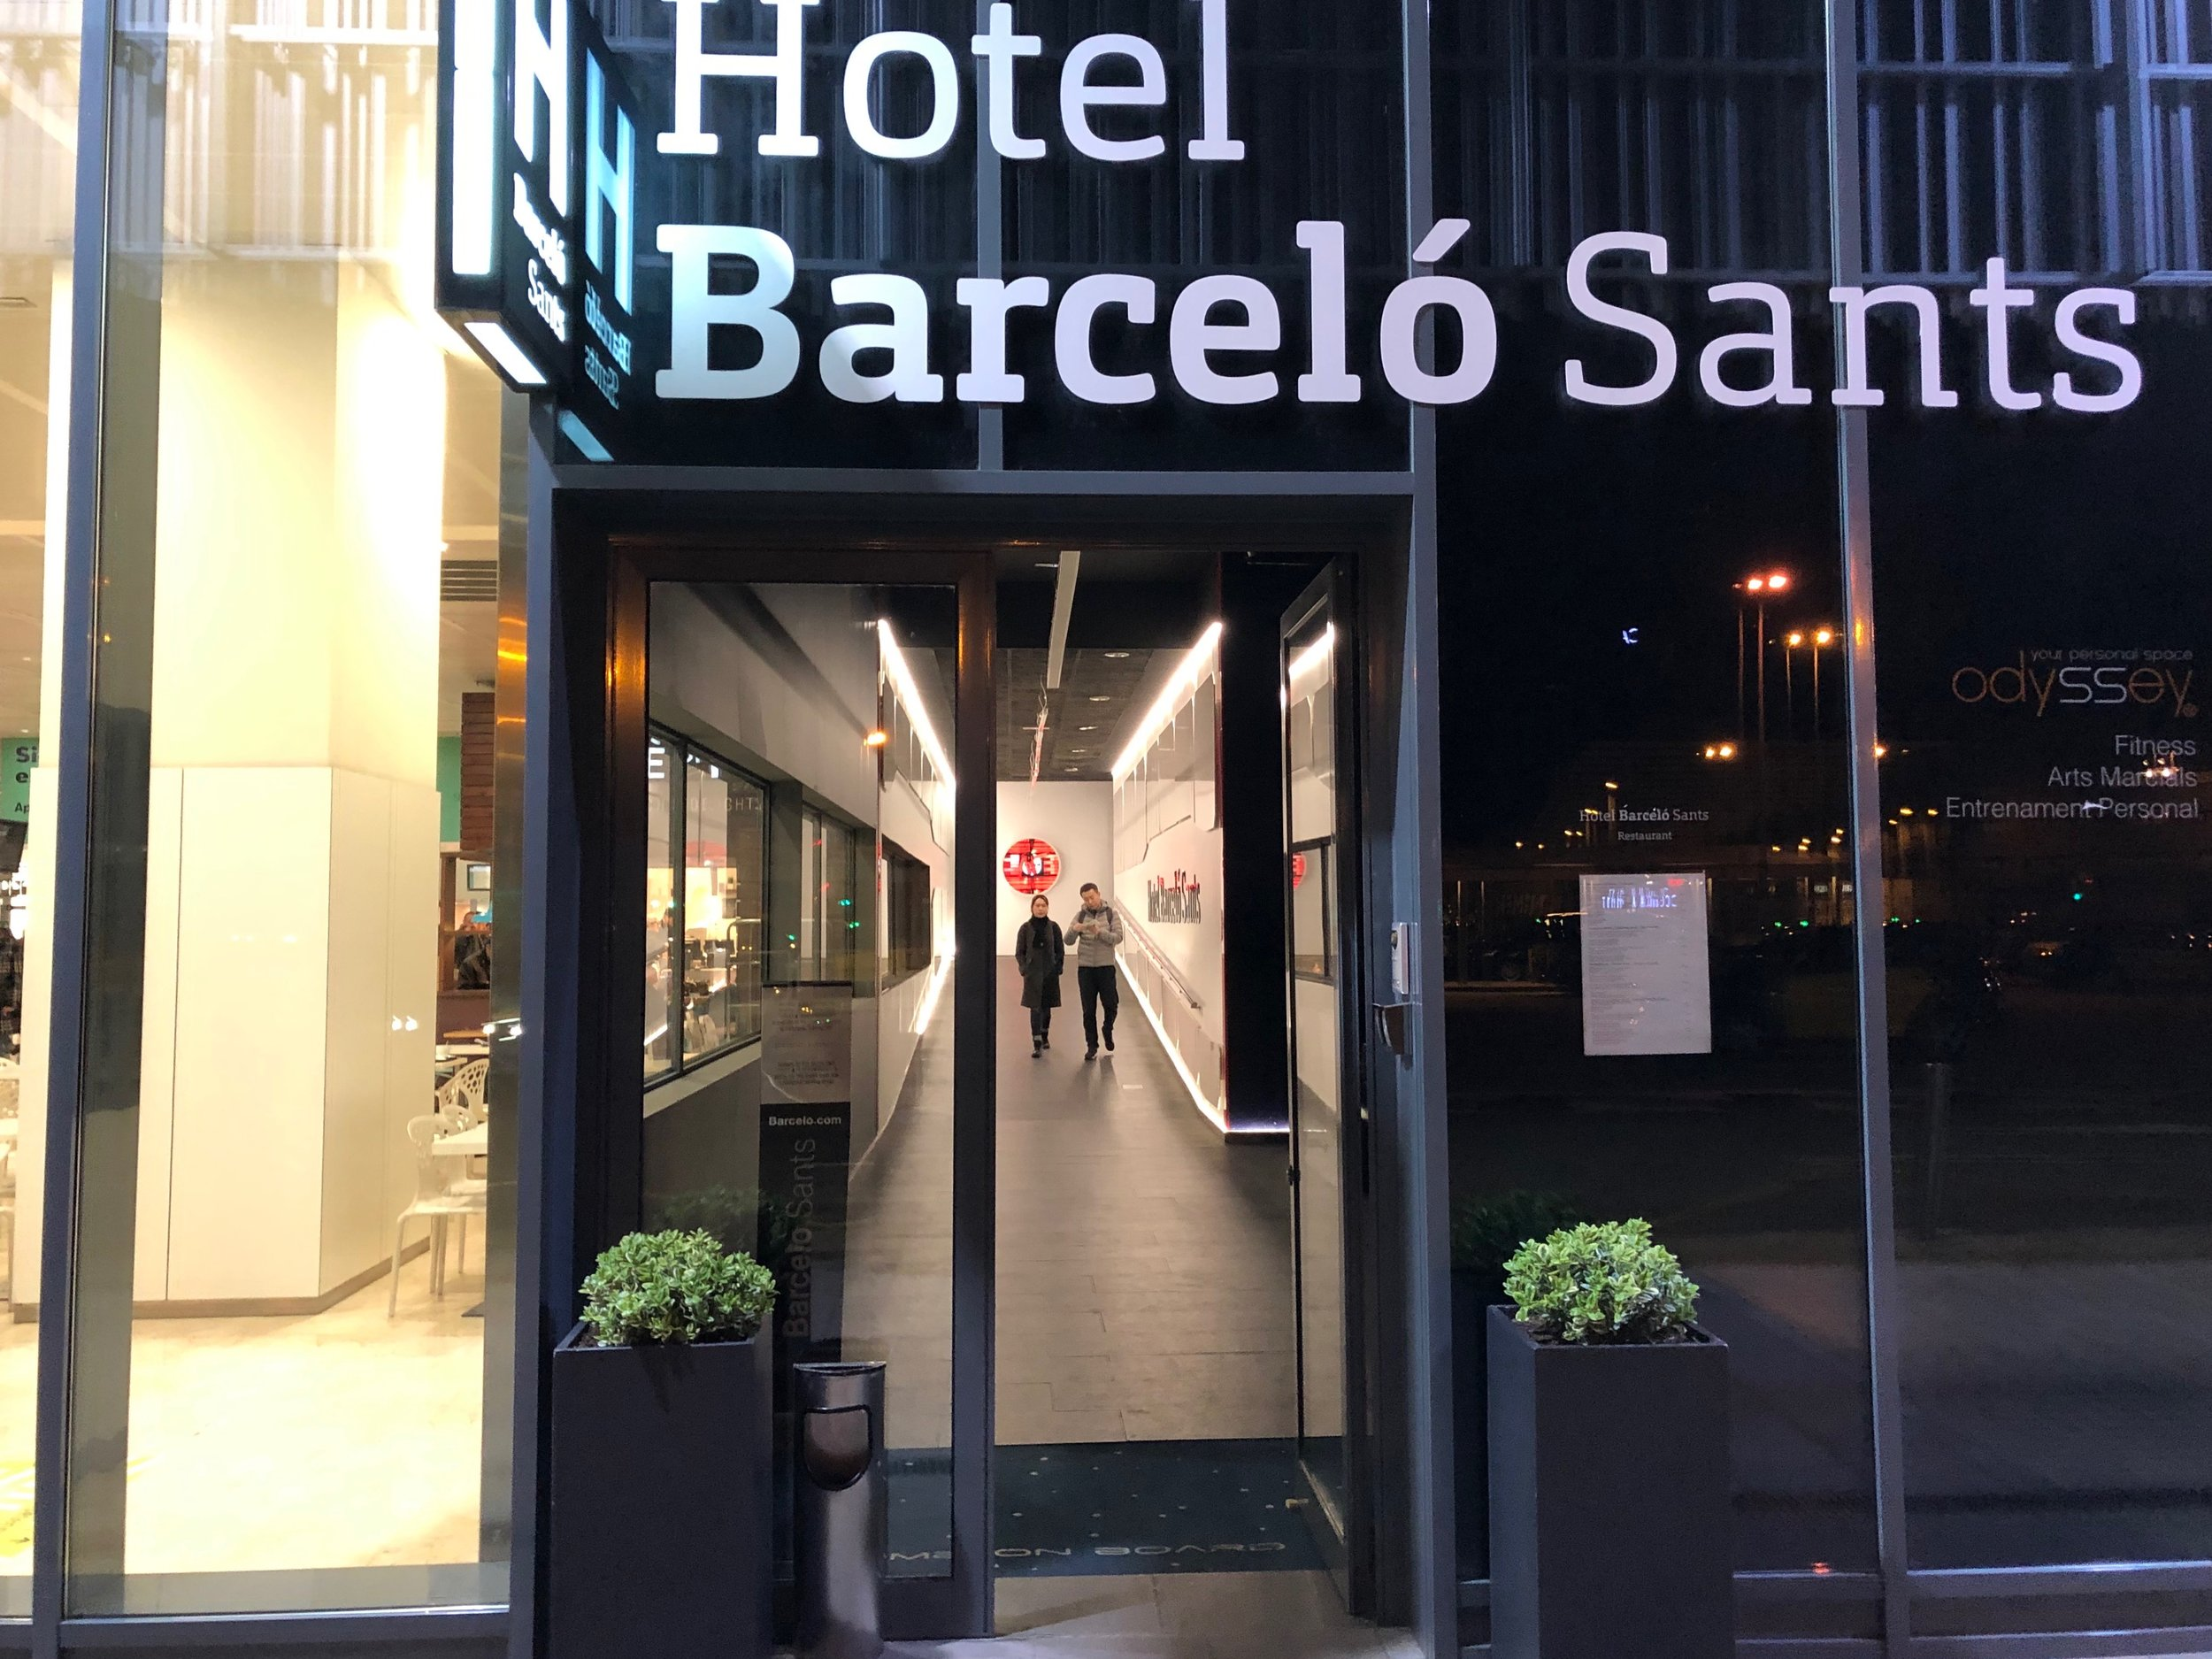 Barcelo Sants entry